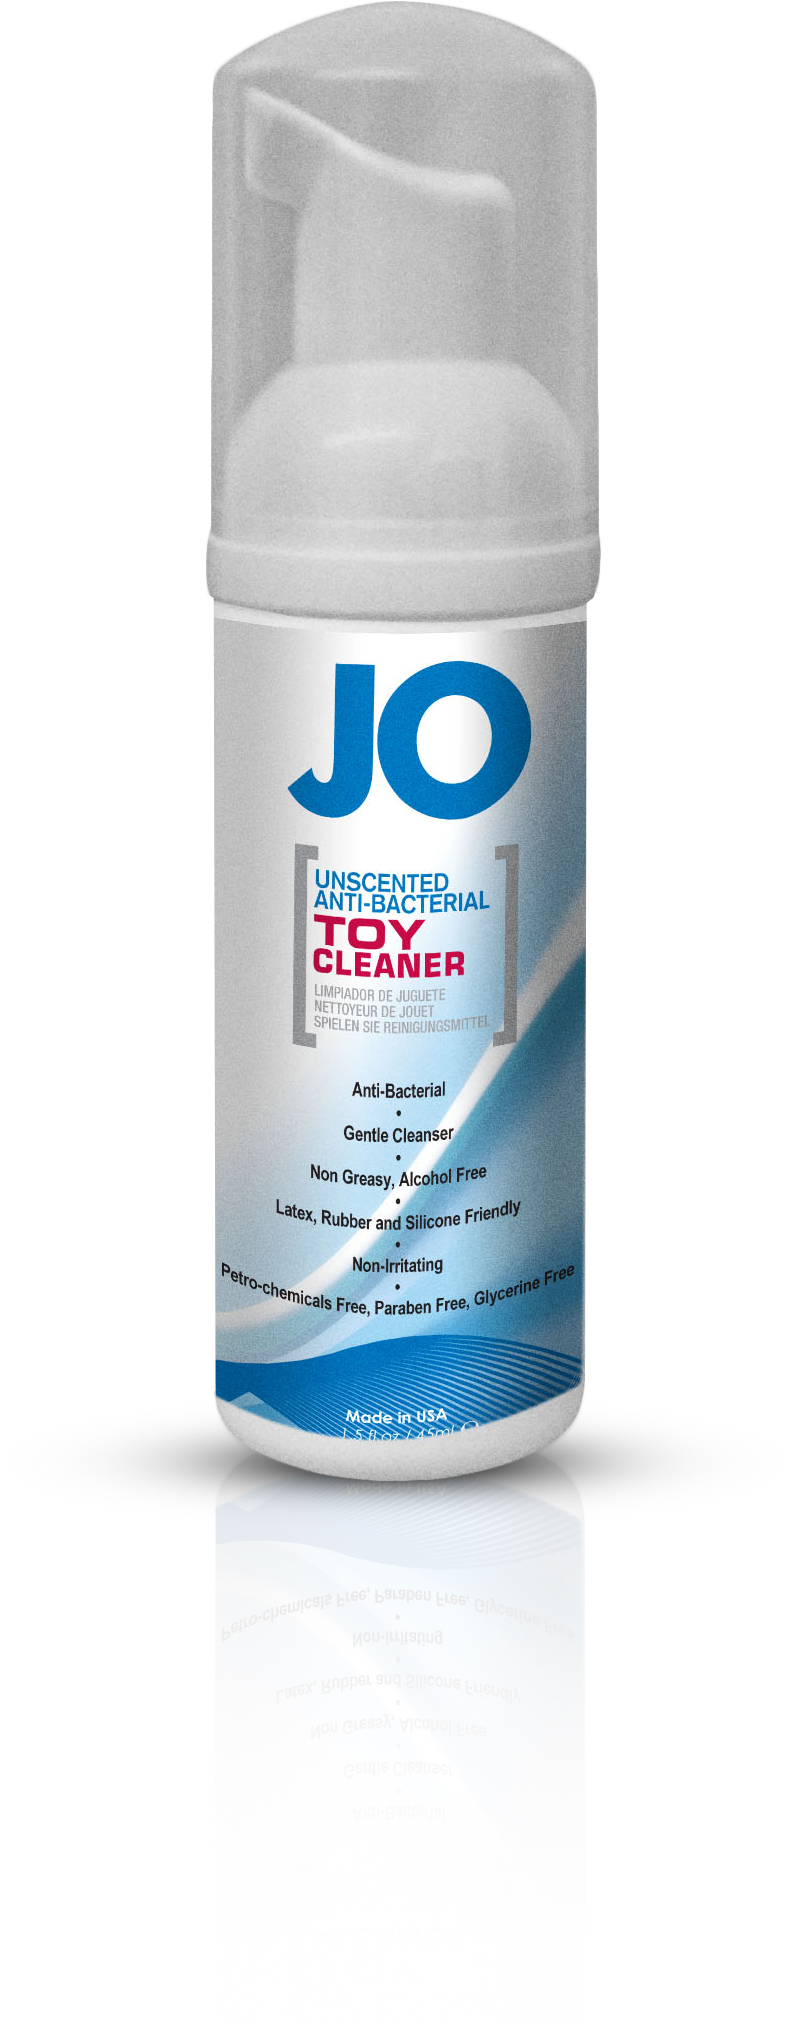 40376_JO_toy_cleaner_1.7oz.jpg